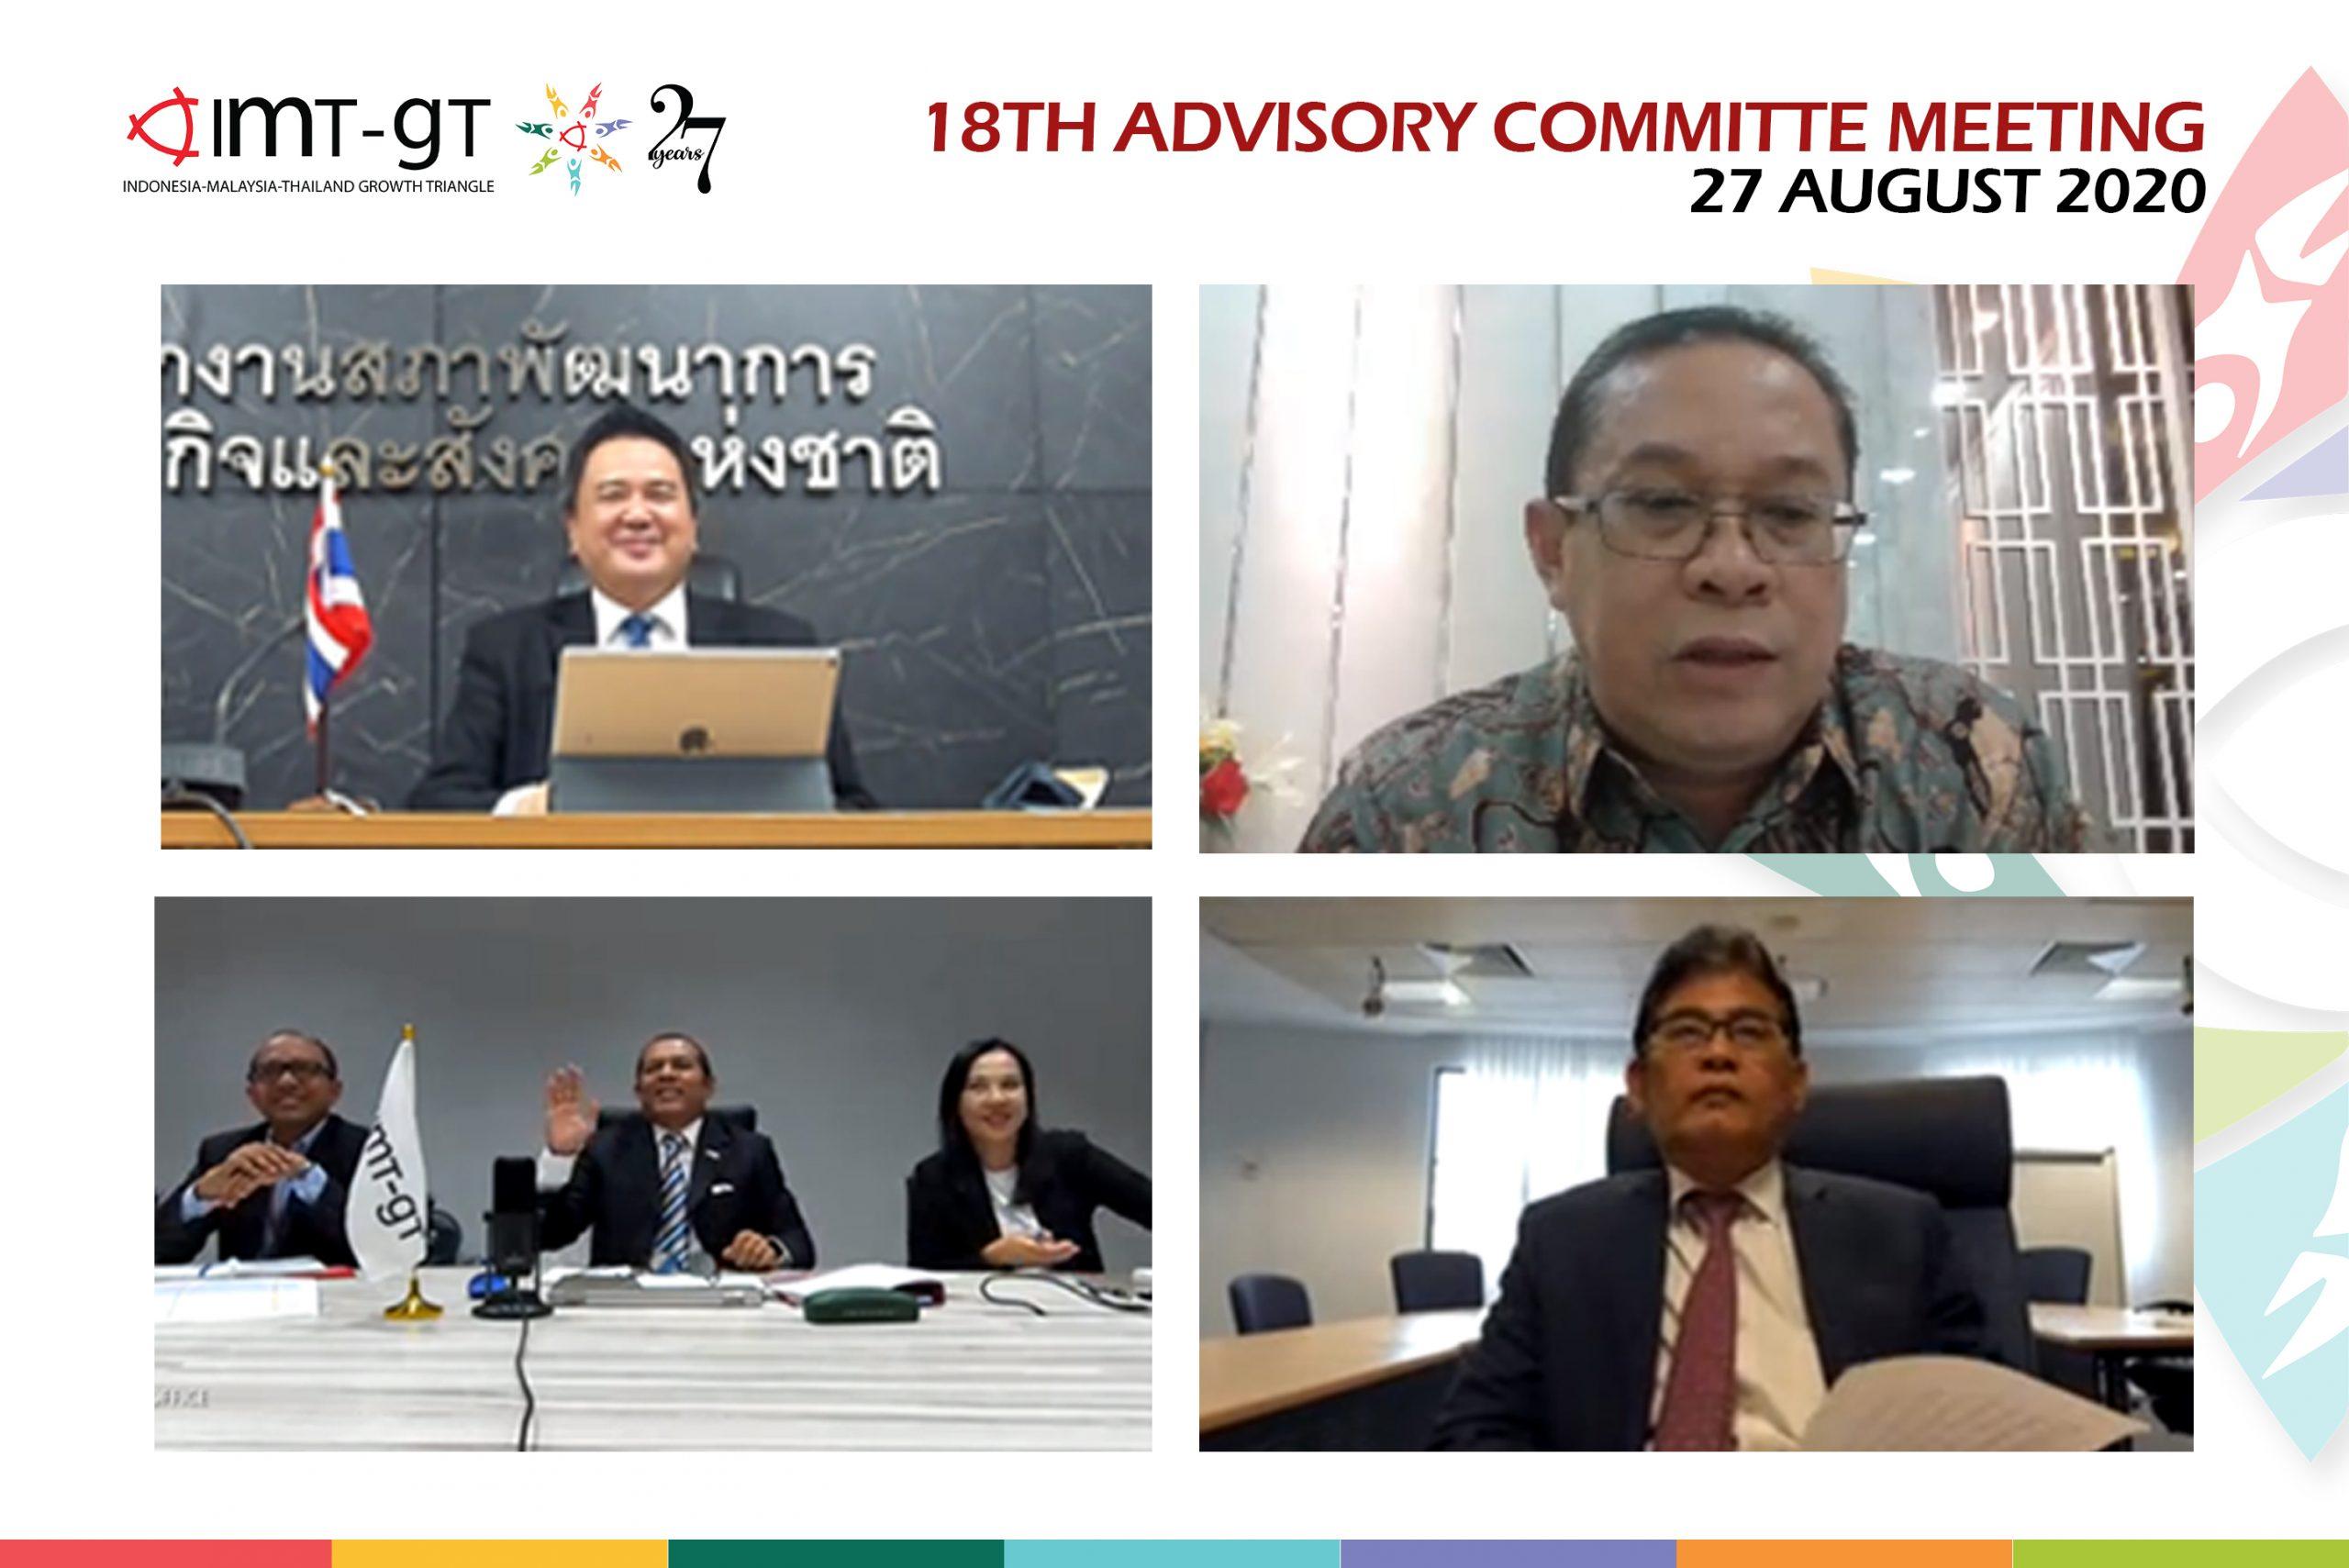 18th Advisory Committee Meeting (ACM)